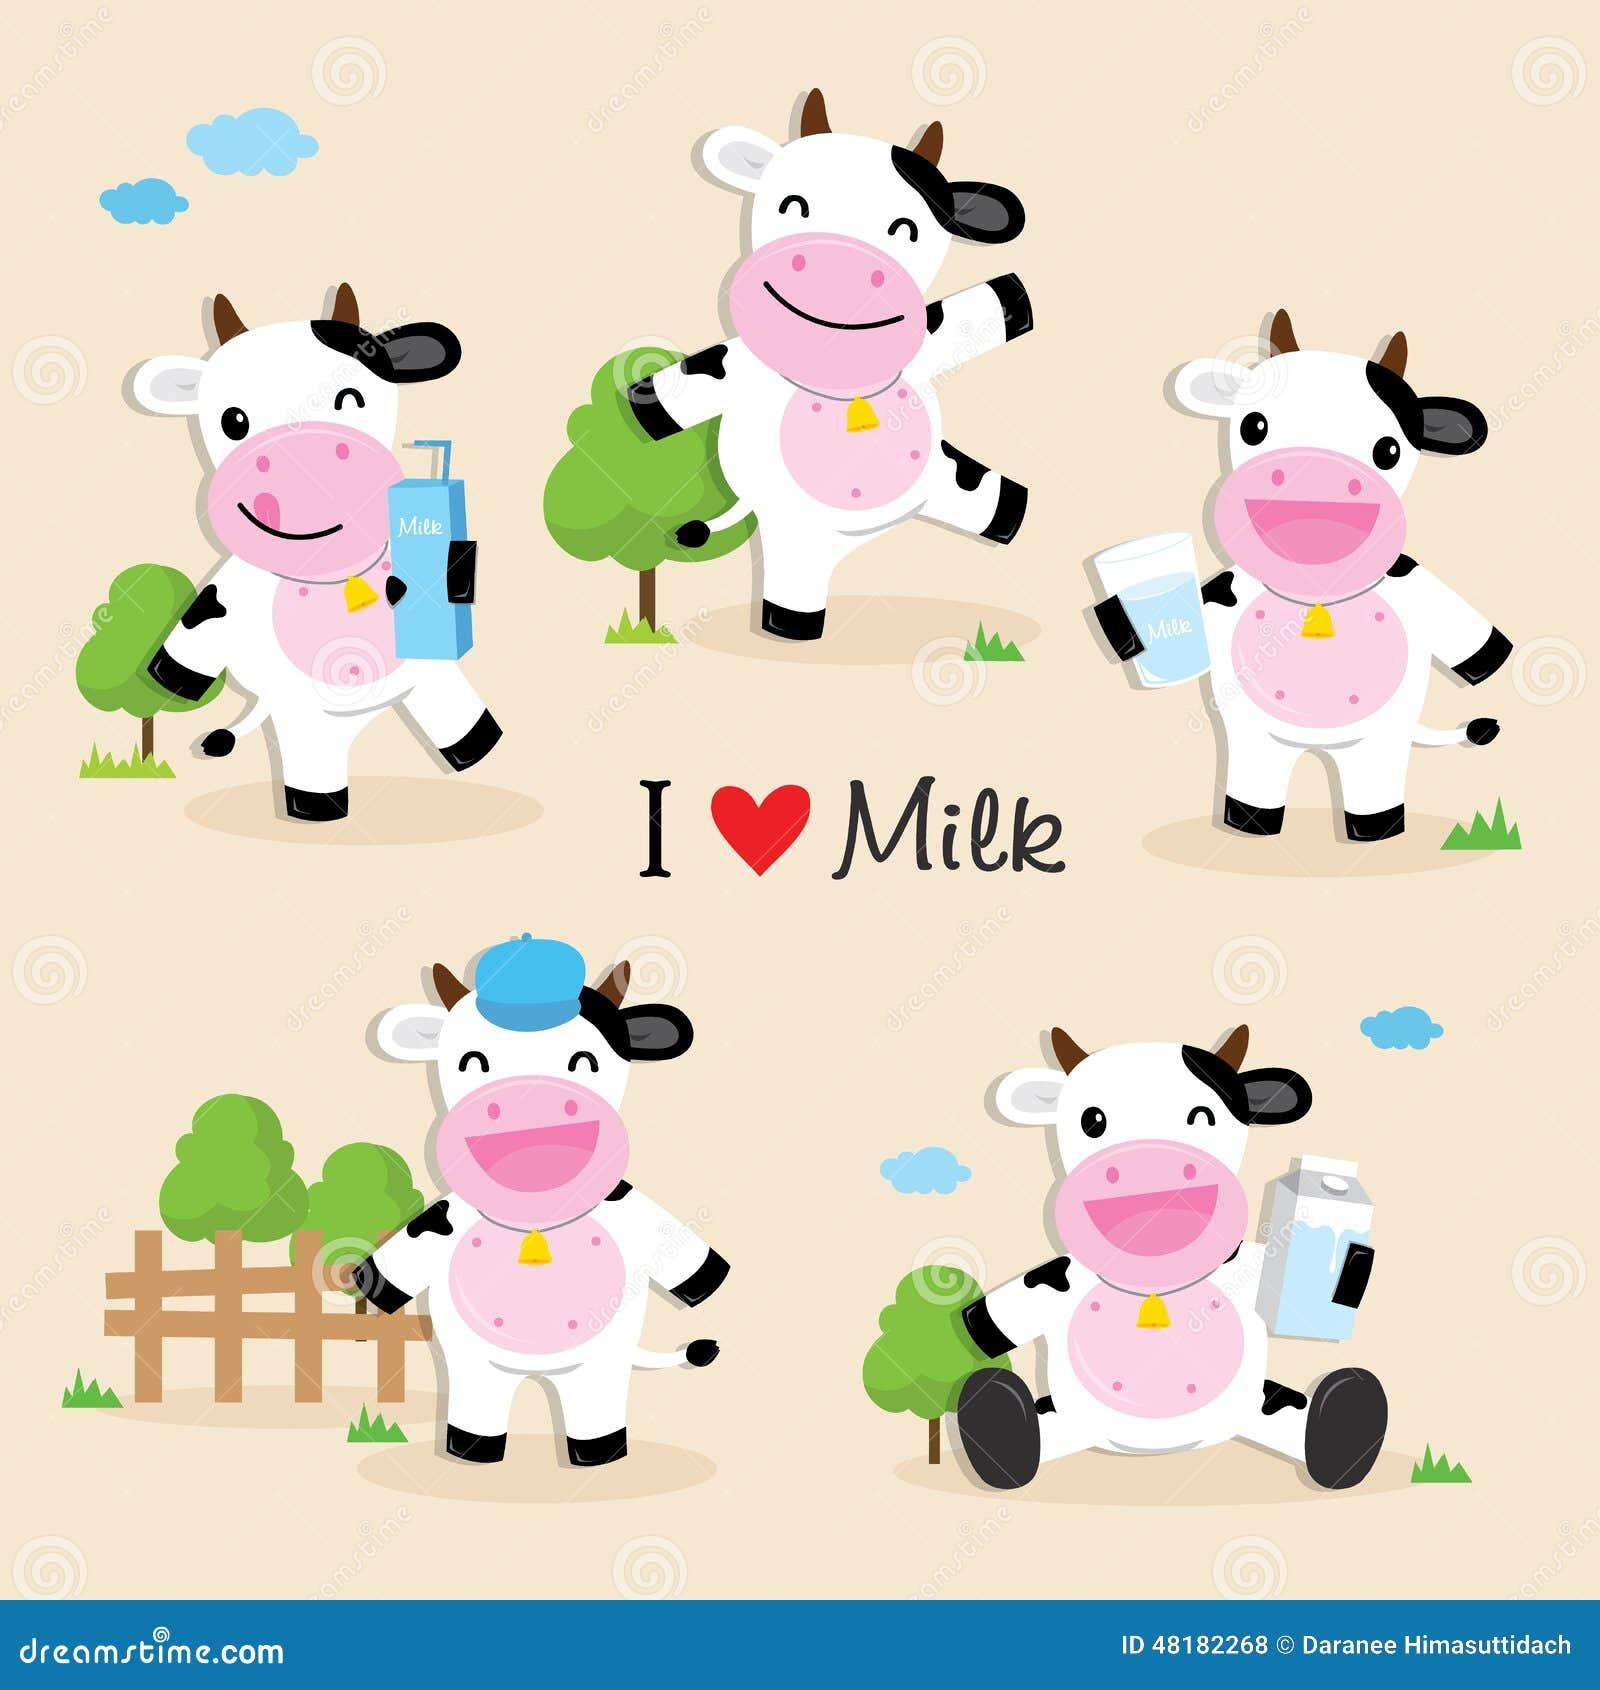 Cute Cartoon Character Design : Cow cute character cartoon design vector stock